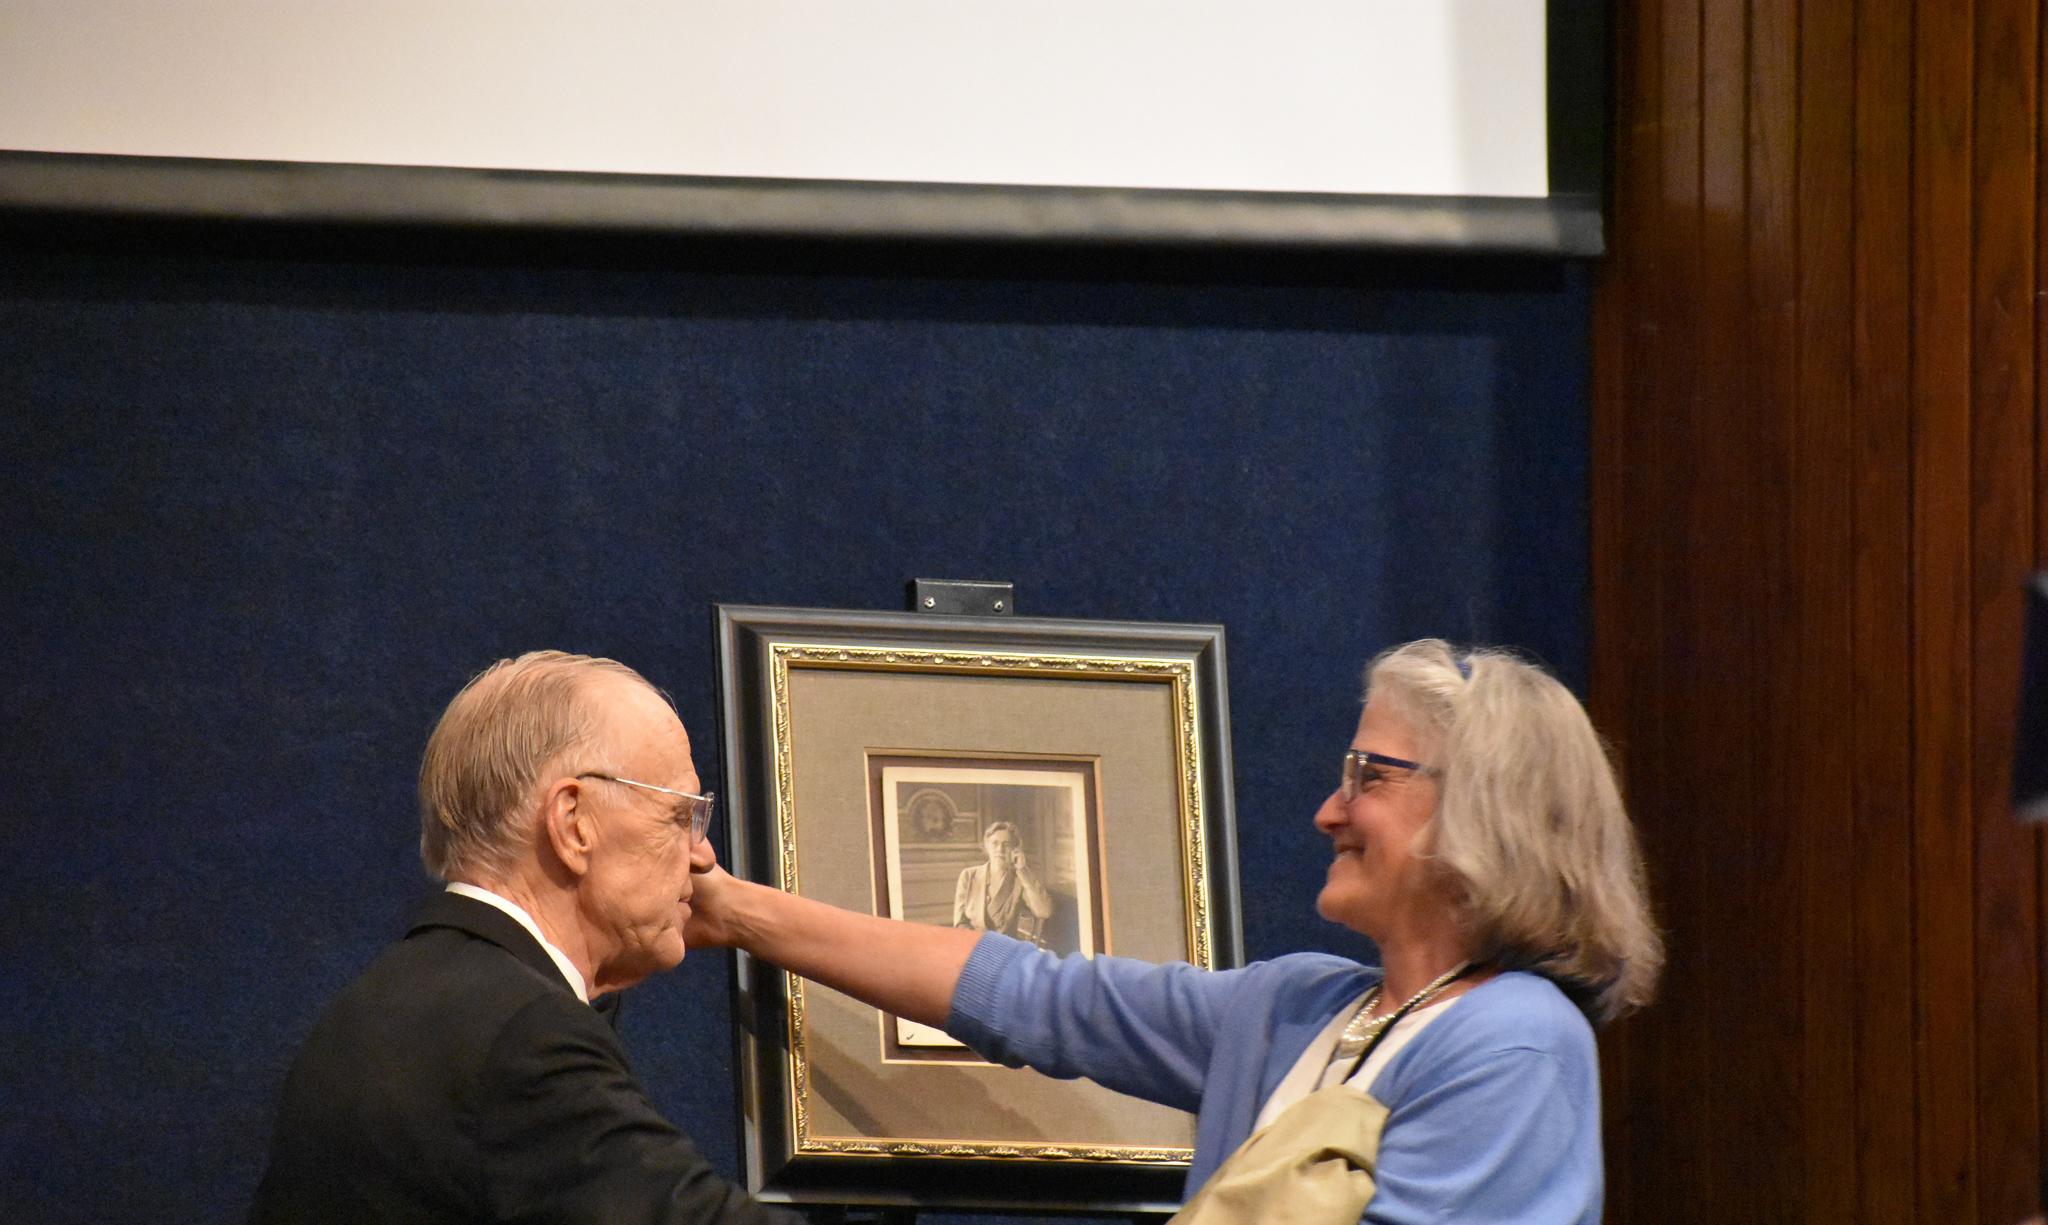 Presenting a photo of Nadia Boulanger